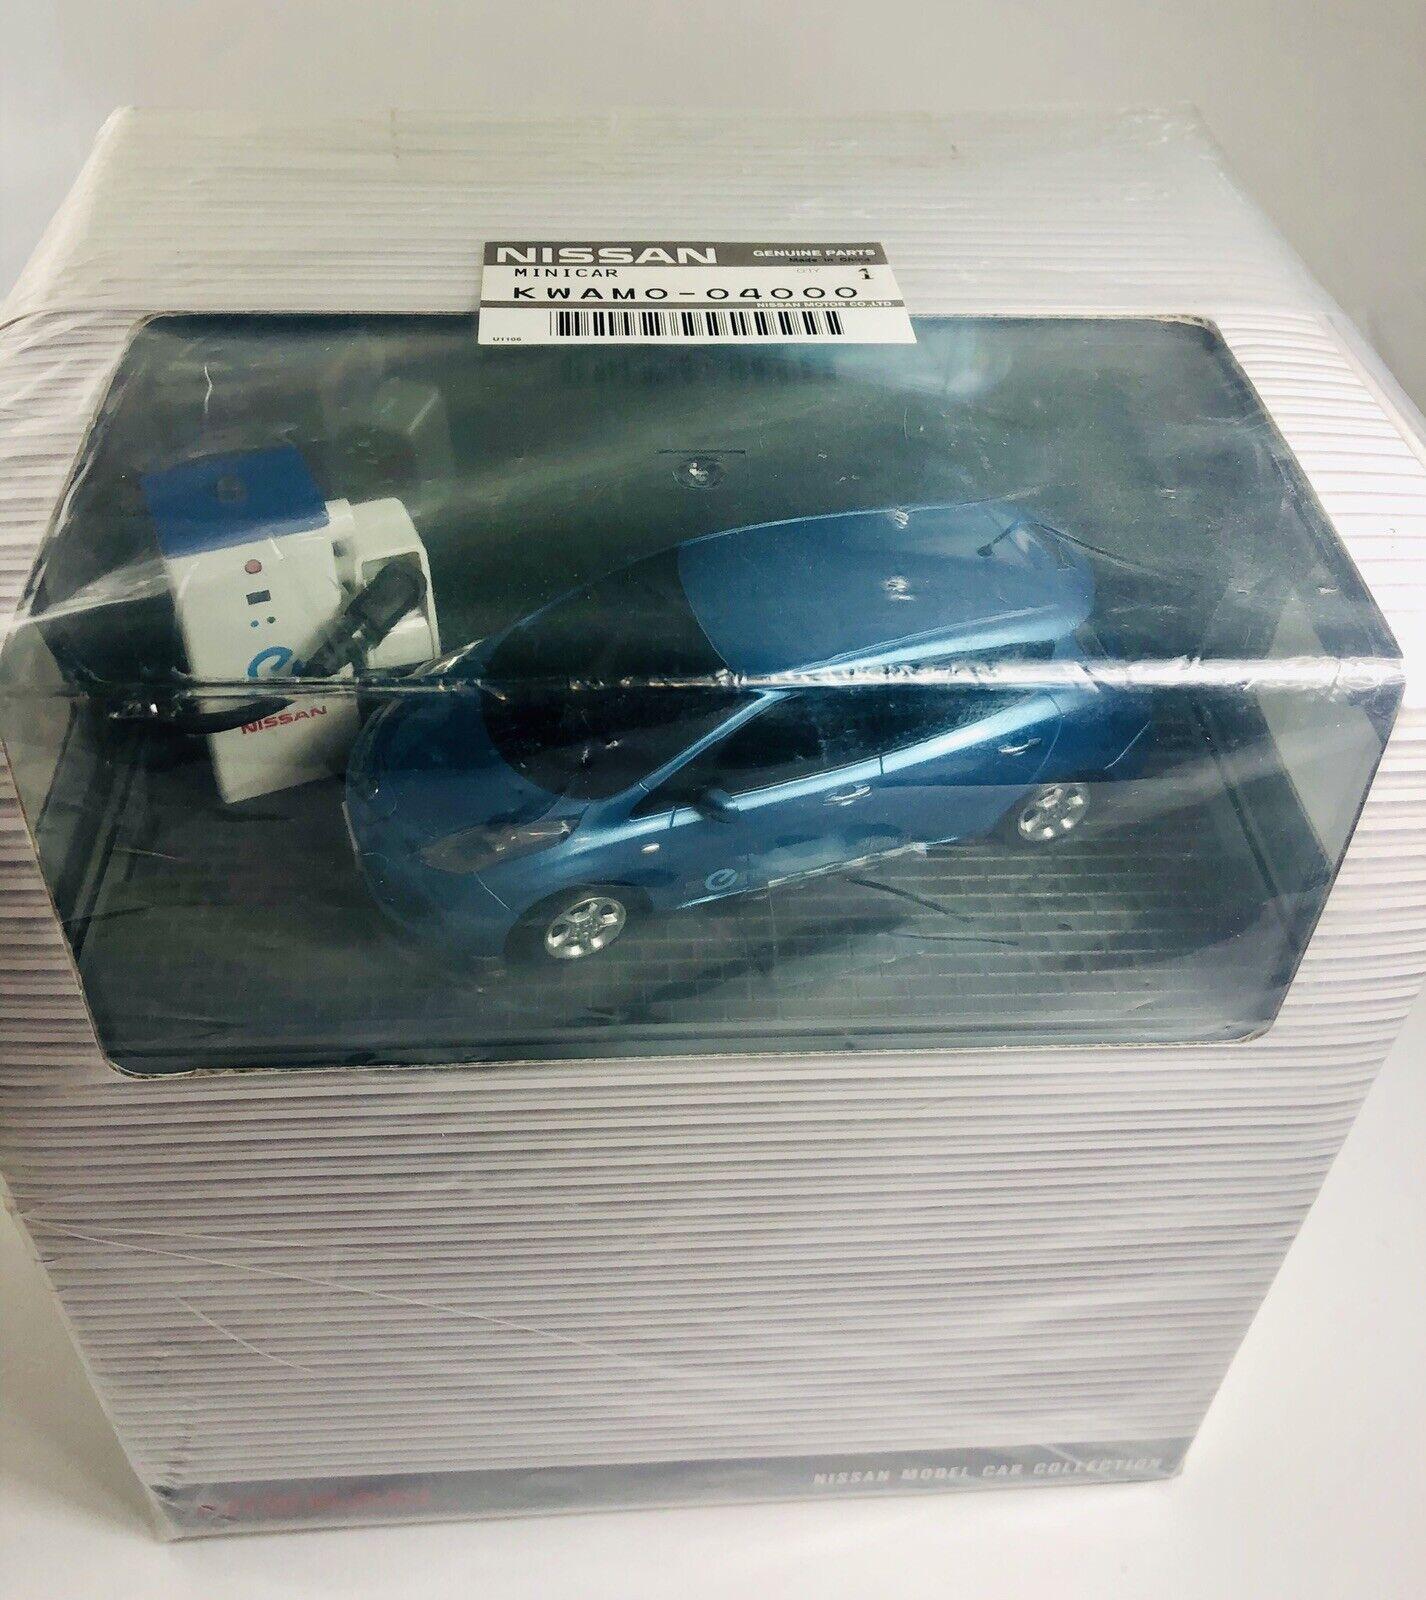 Kyosho 1 32 Mini-Z Lit RC Nissan  Leaf Brilliant Aqua blu   Japan KWAMO-04000  risparmia il 50% -75% di sconto